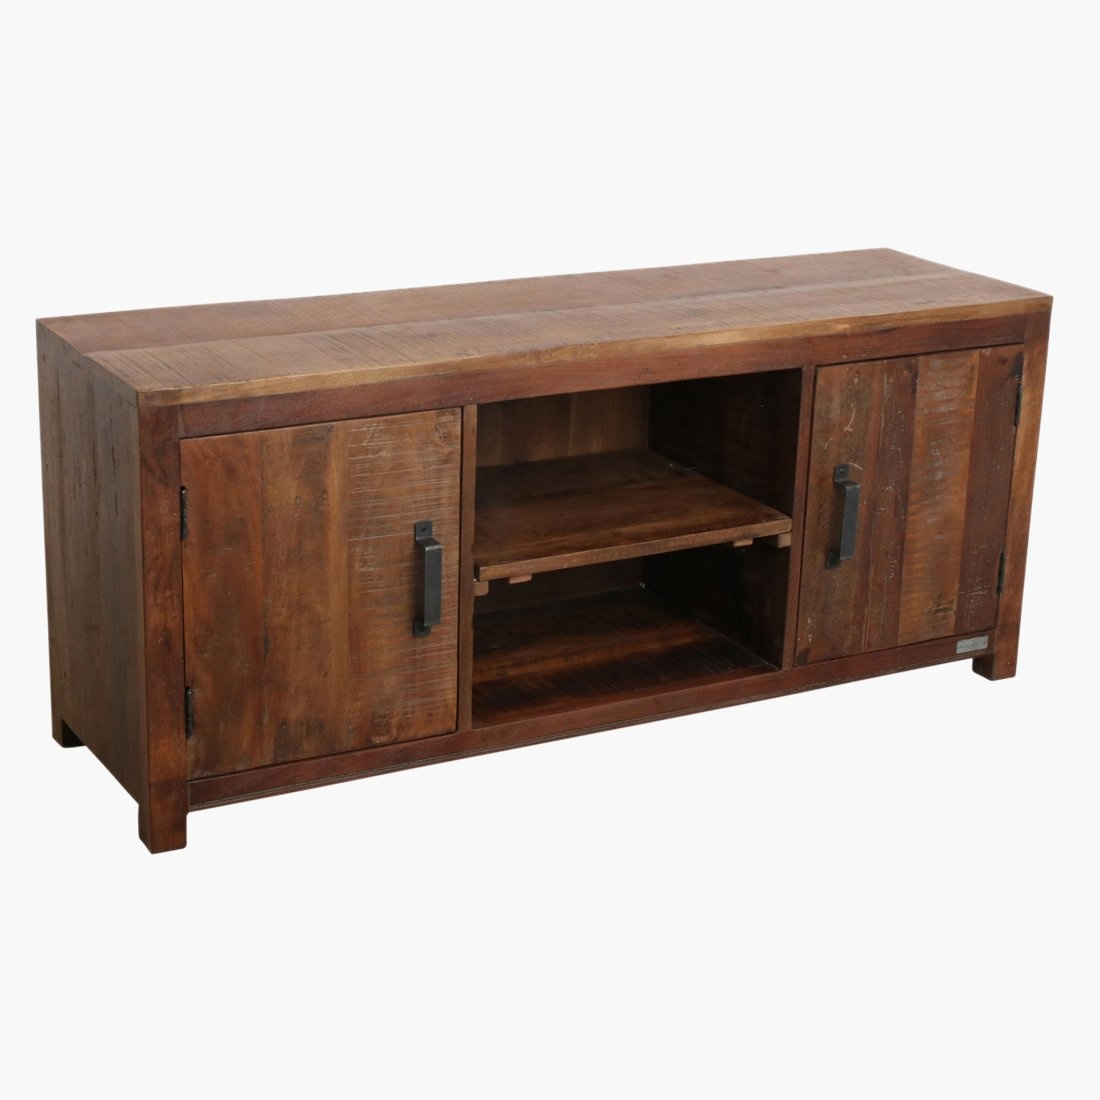 Petite Lily Interiors TV console - FSC wood - 140x40xh60cm